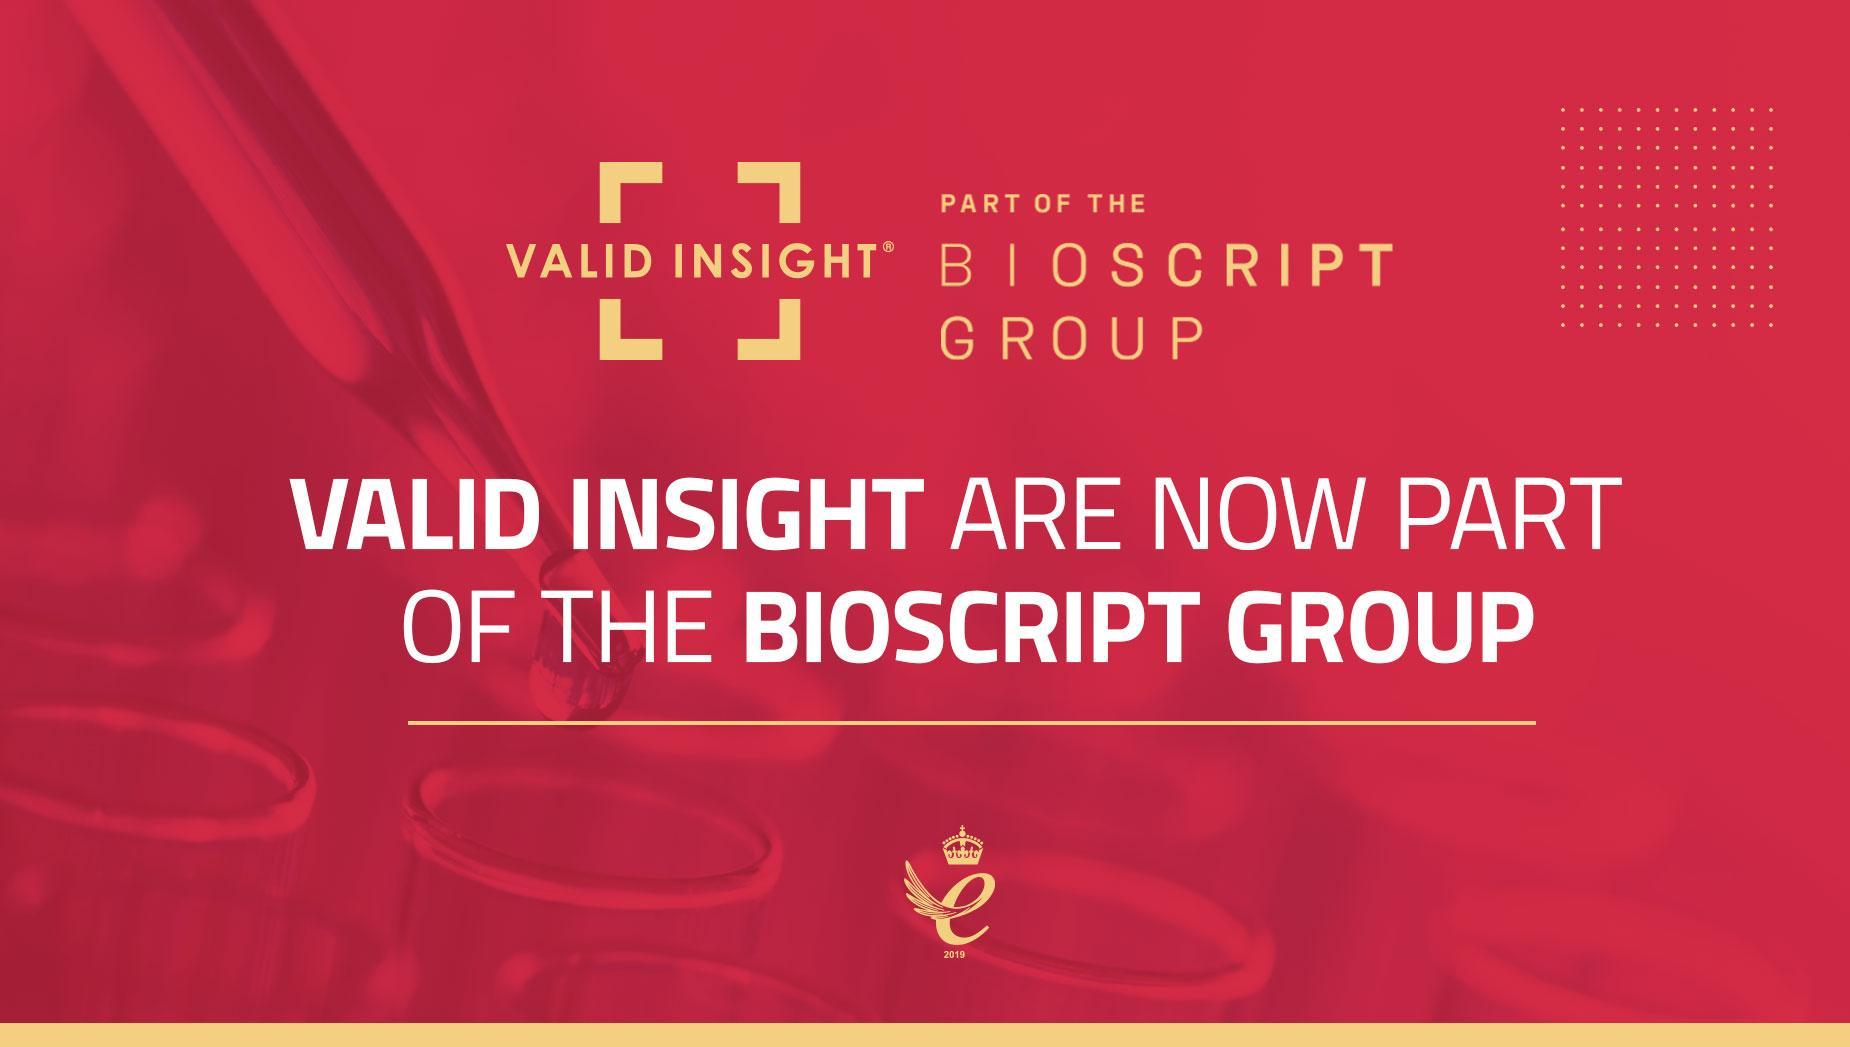 Bioscript and Valid Insight